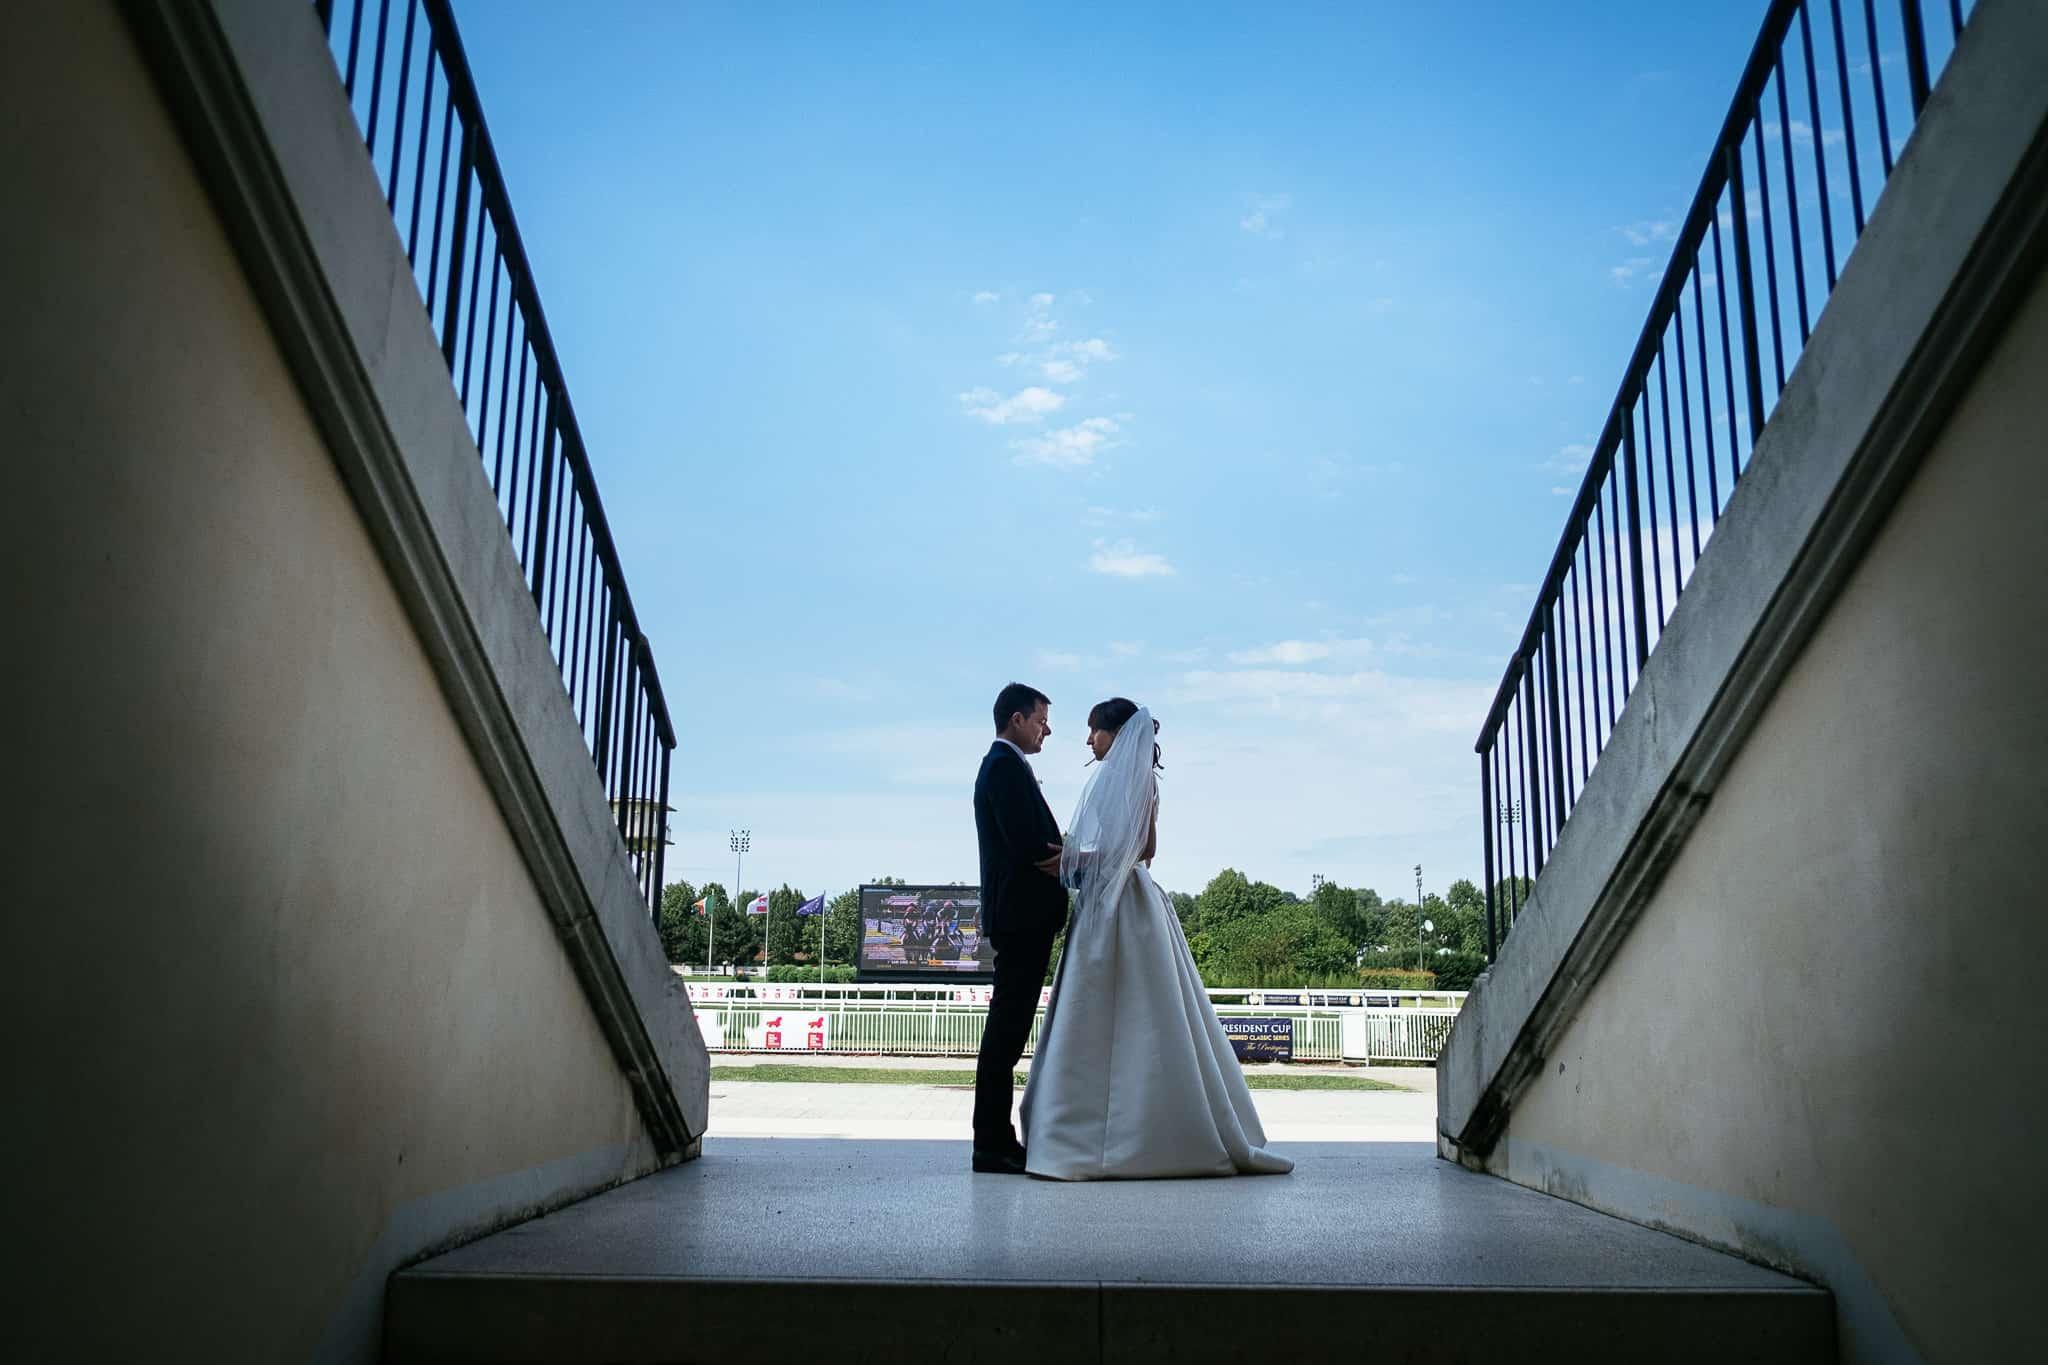 matrimonio Canter Milano San siro Luca rossi wedding reportage 0038